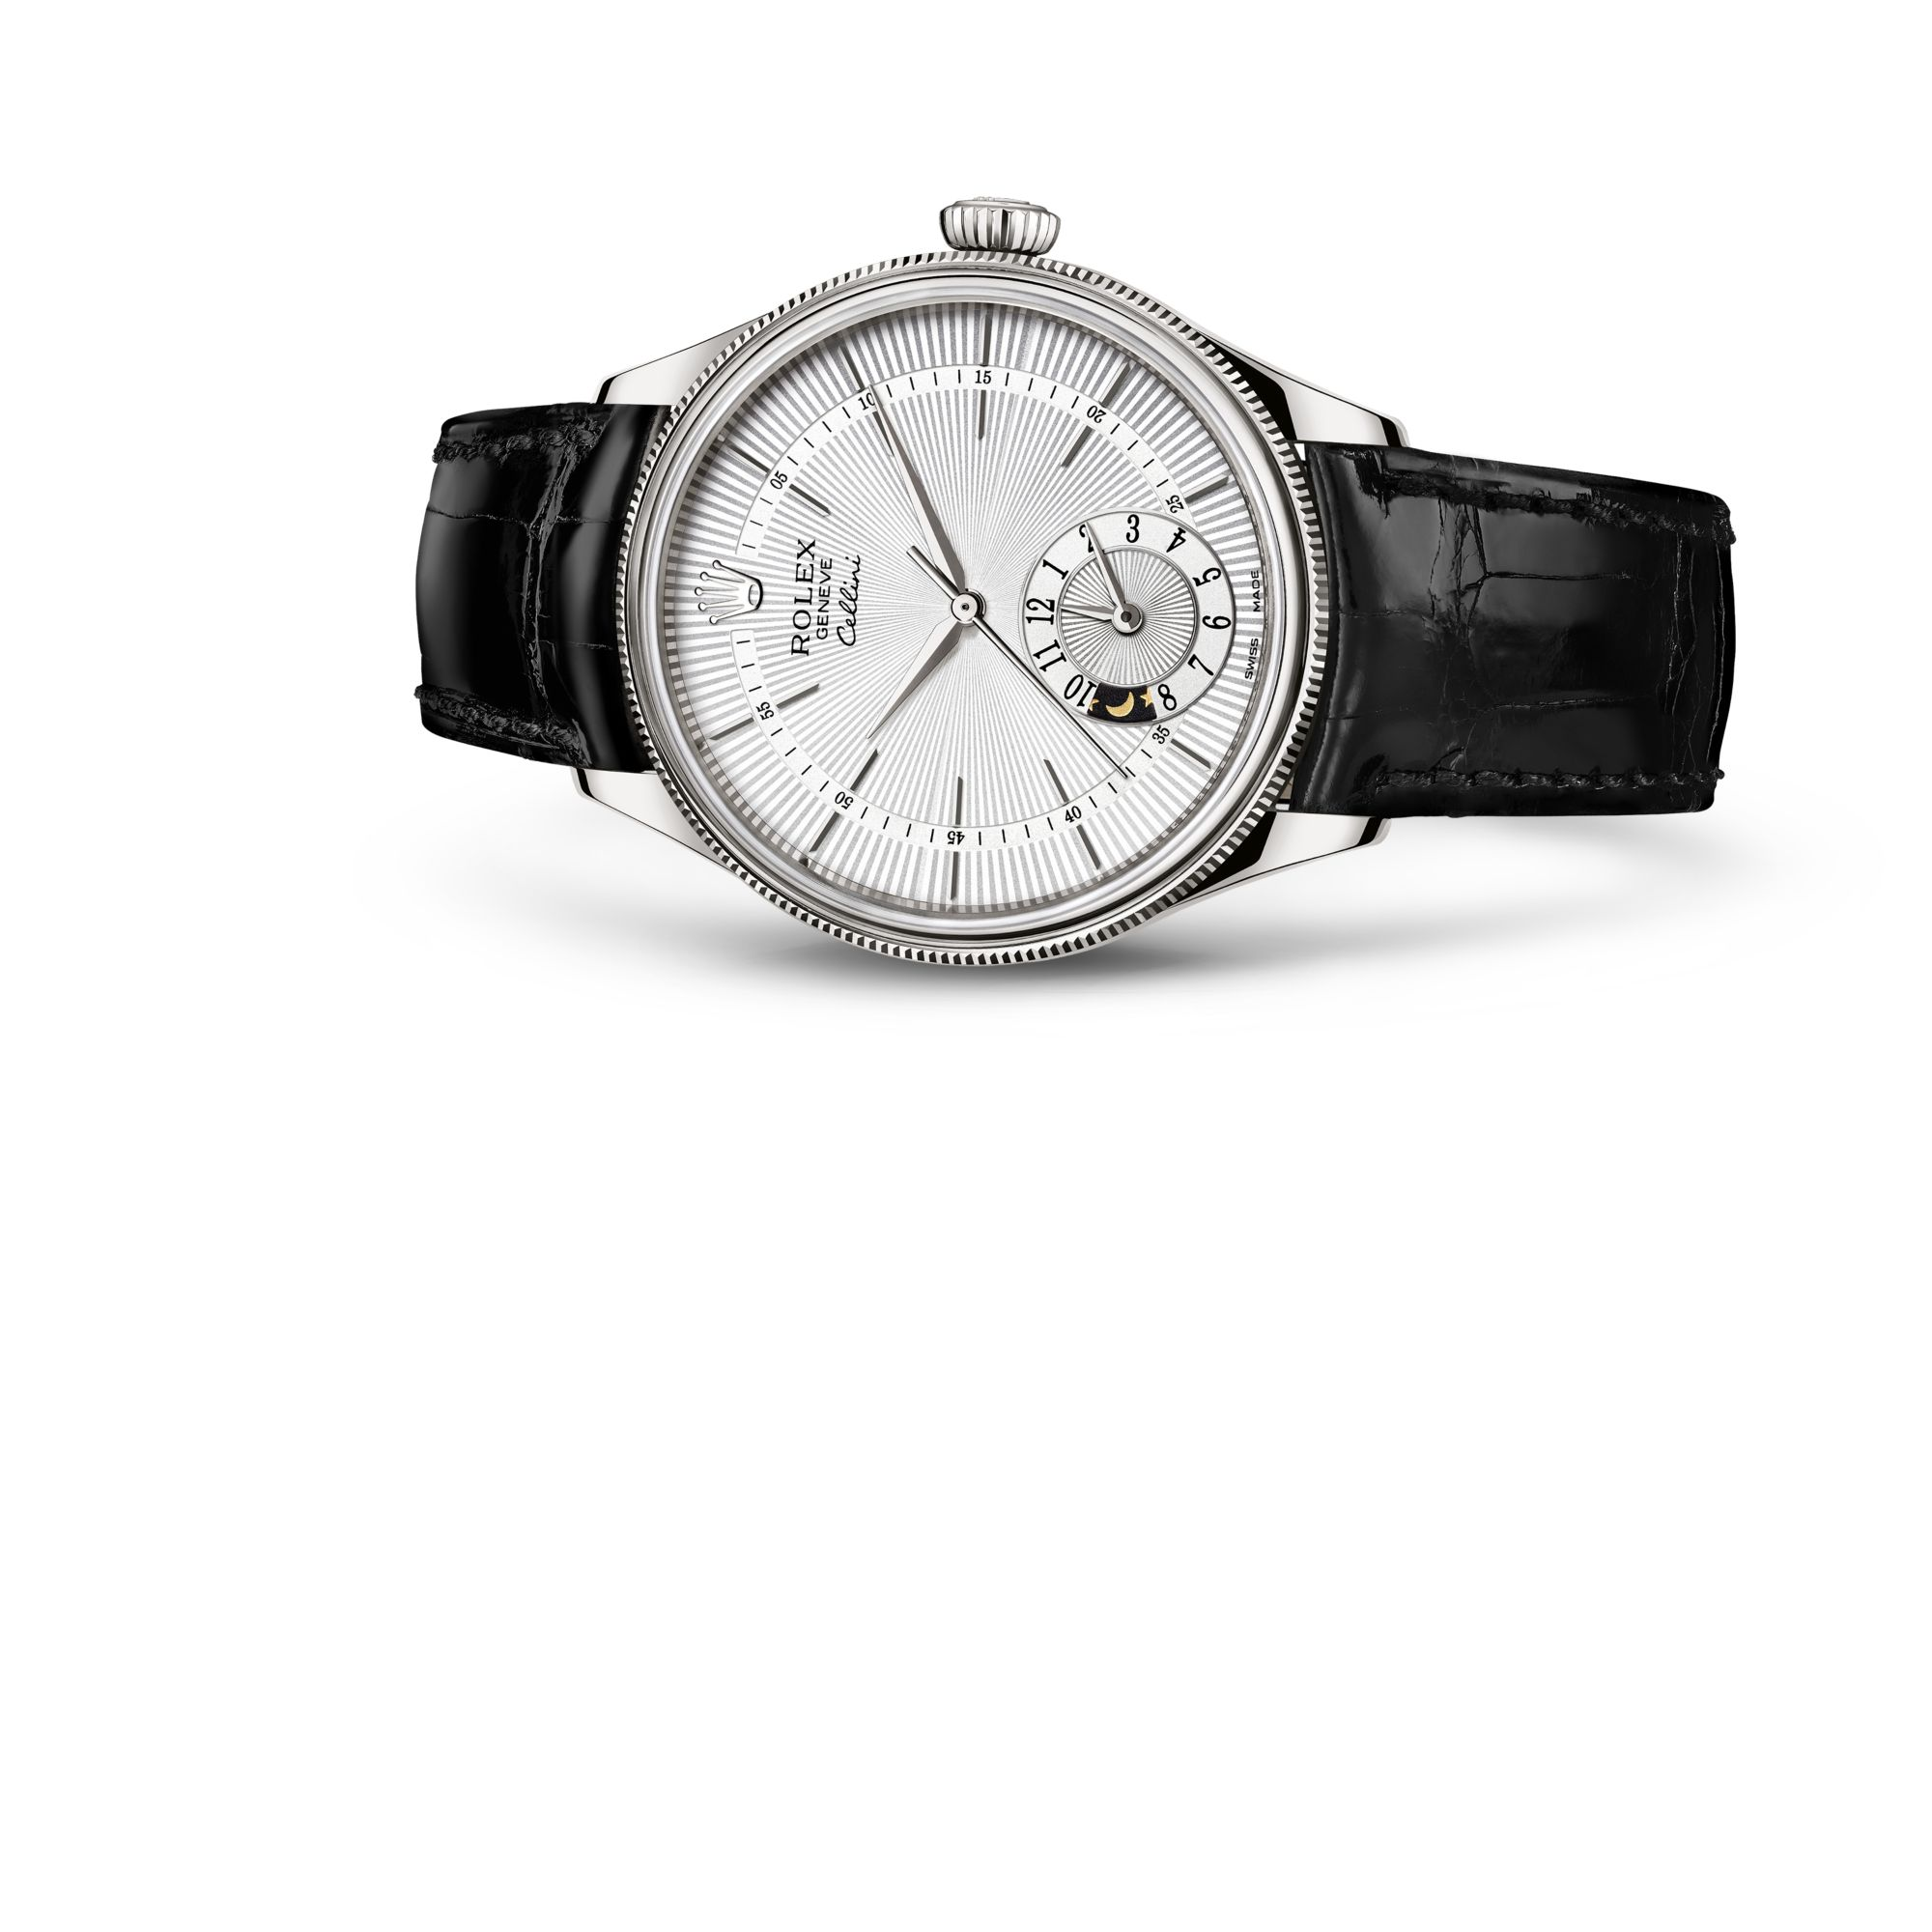 Rolex Cellini Dual Time M50529-0006